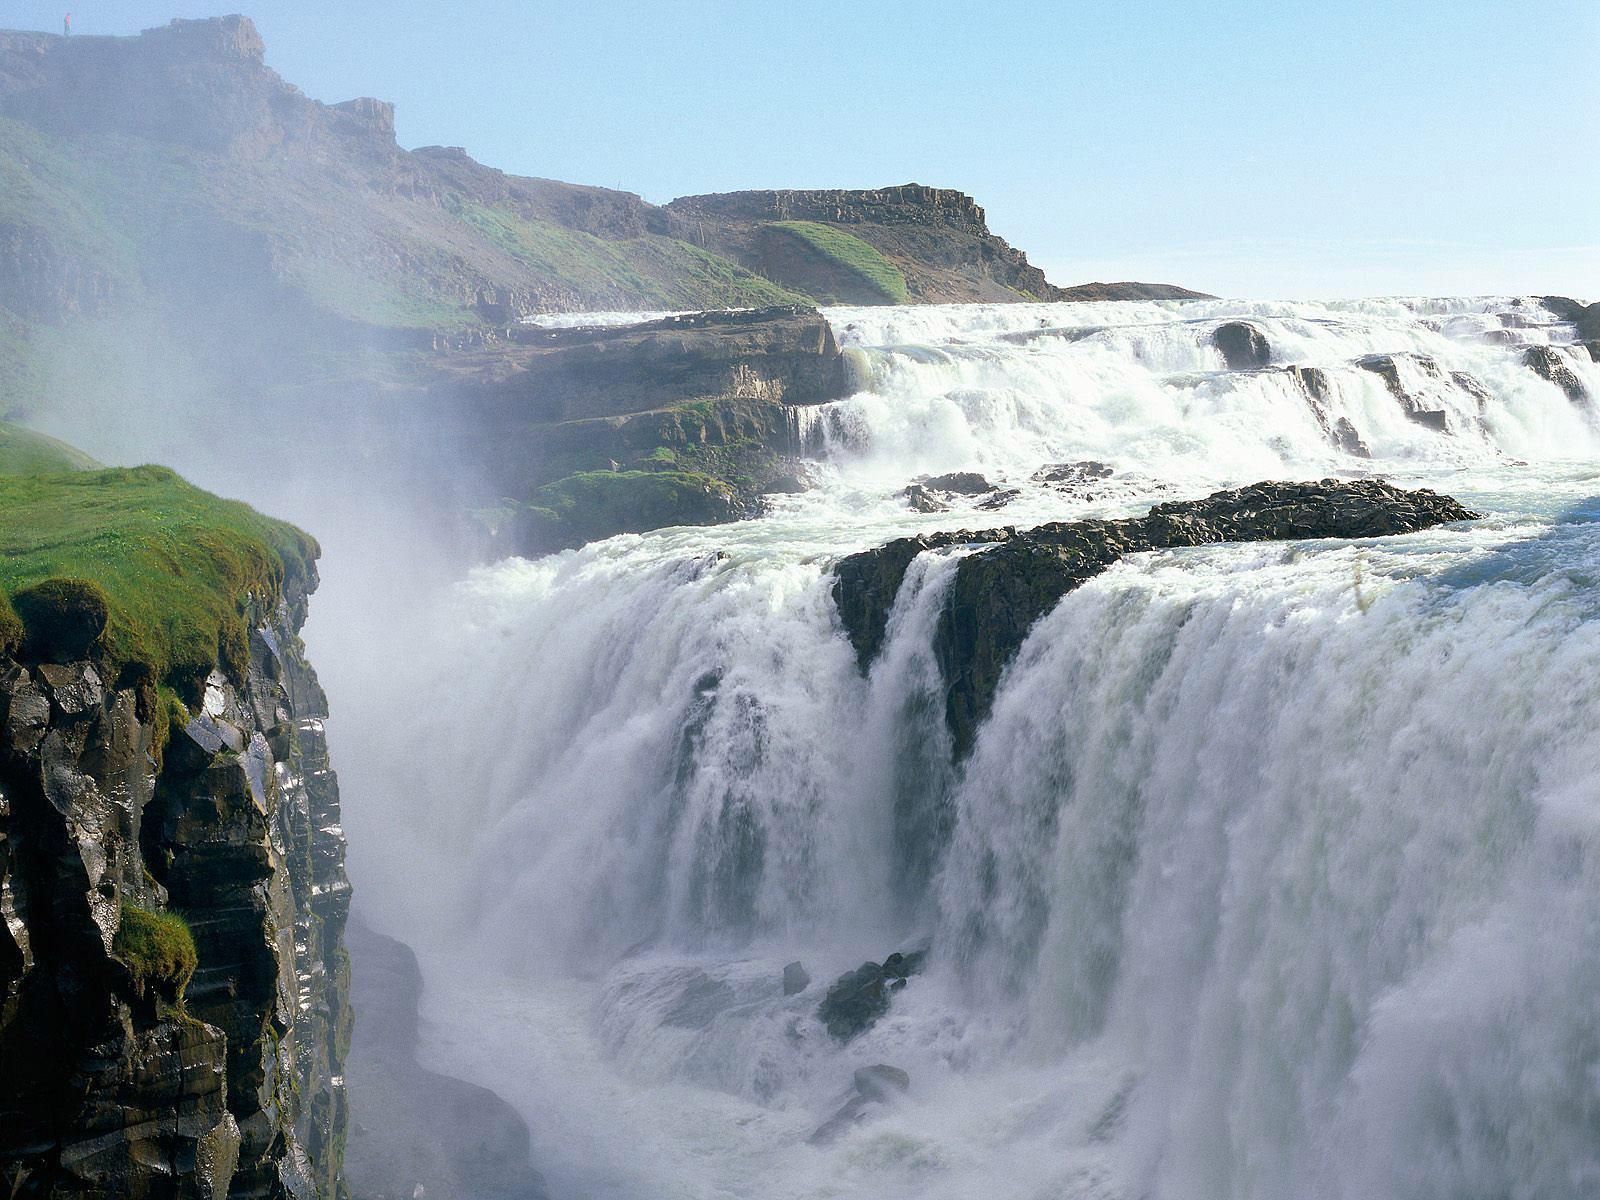 http://4.bp.blogspot.com/-4eU4LBgFjIE/TnnONNr1AMI/AAAAAAAANOQ/mE_bTh_BYLc/s1600/Mooie-watervallen-achtergronden-hd-waterval-wallpapers-afbeelding-foto-16.jpg